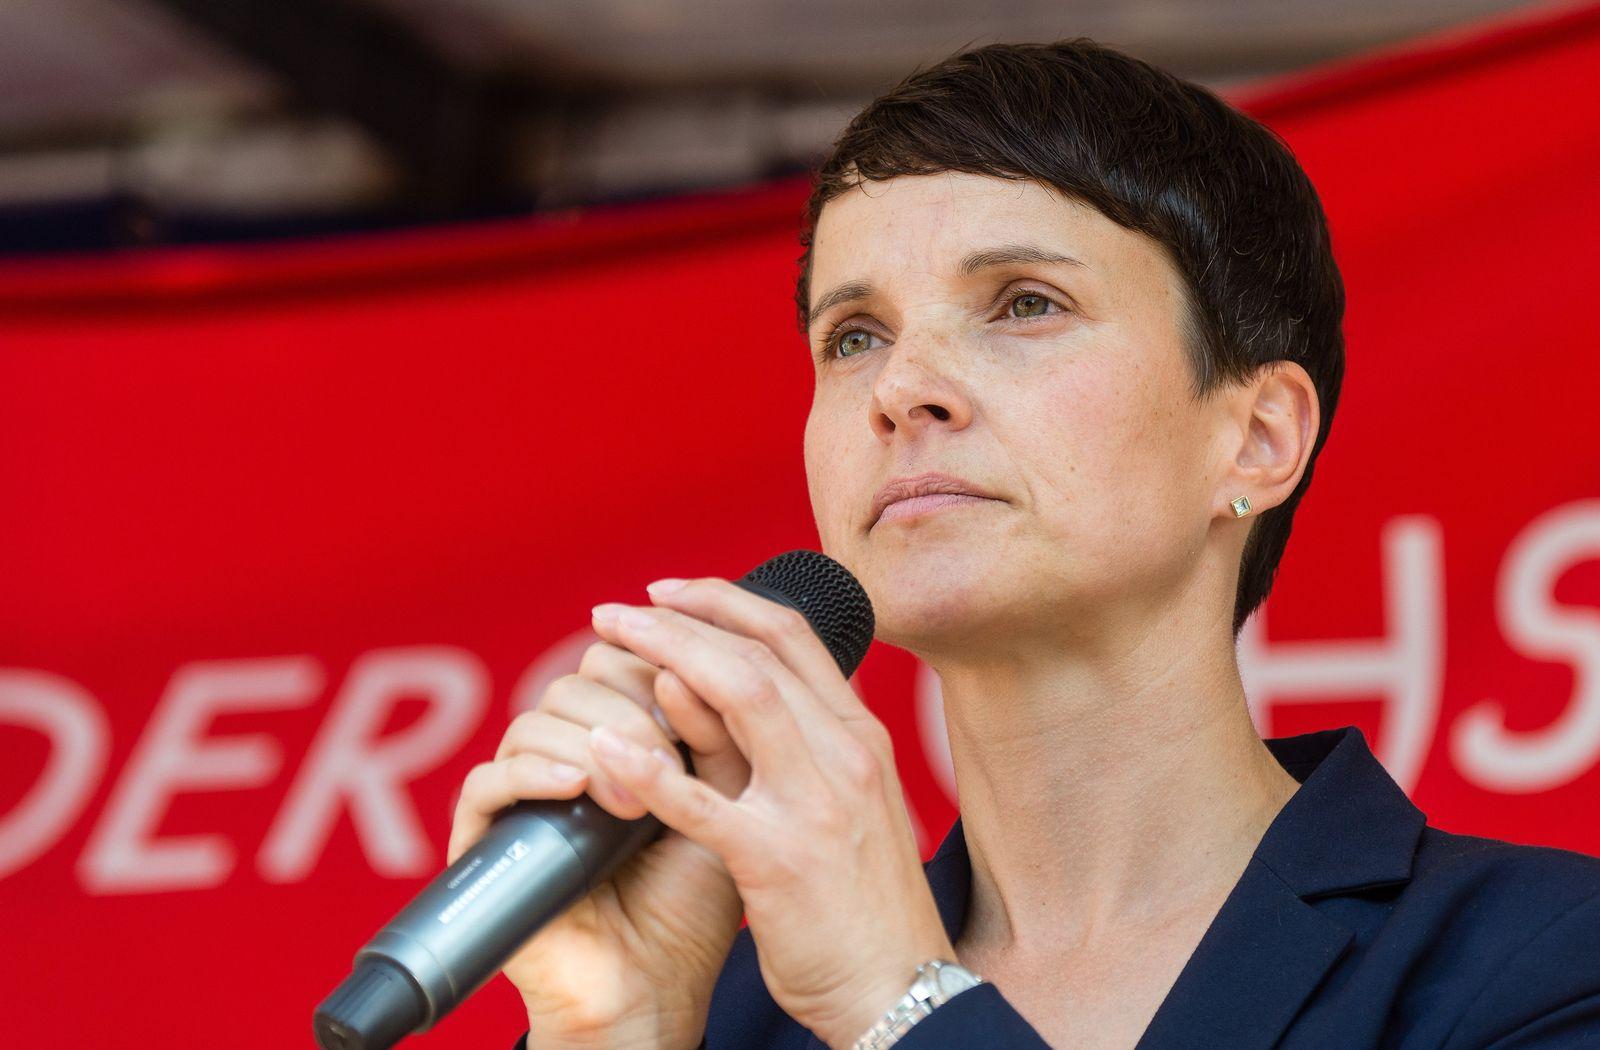 AfD-Wahlkampf Frauke Petry